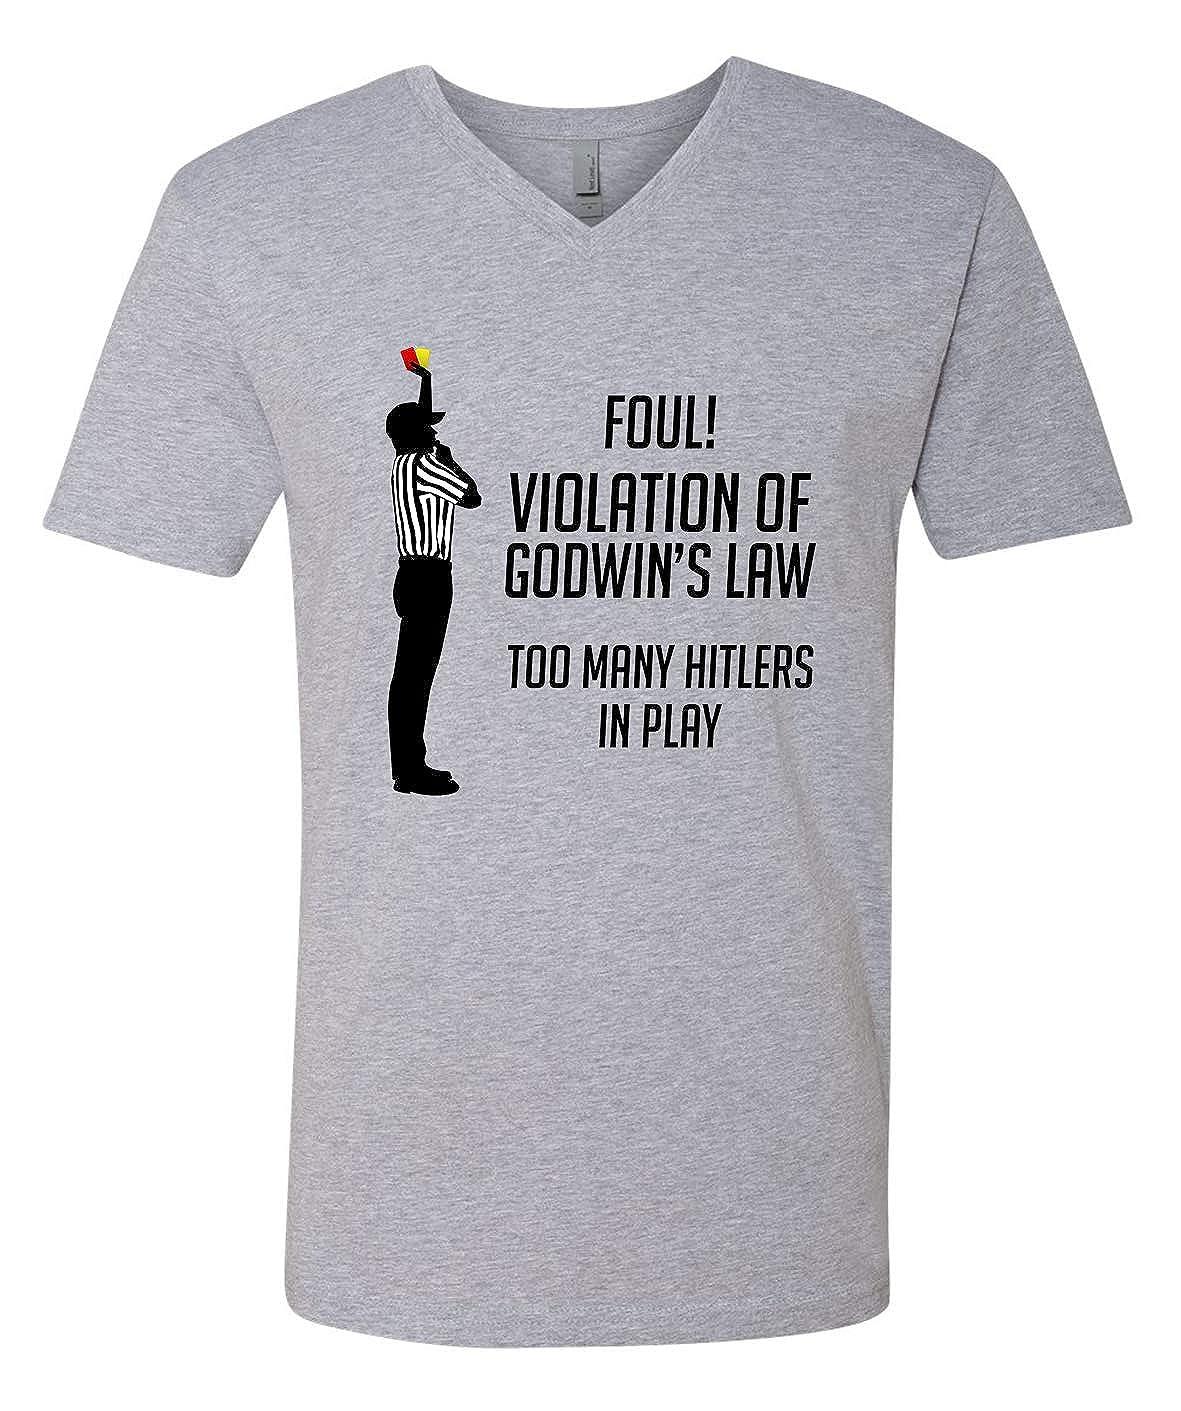 Tenacitee Mens Godwins Law Logical Fallacy T-Shirt